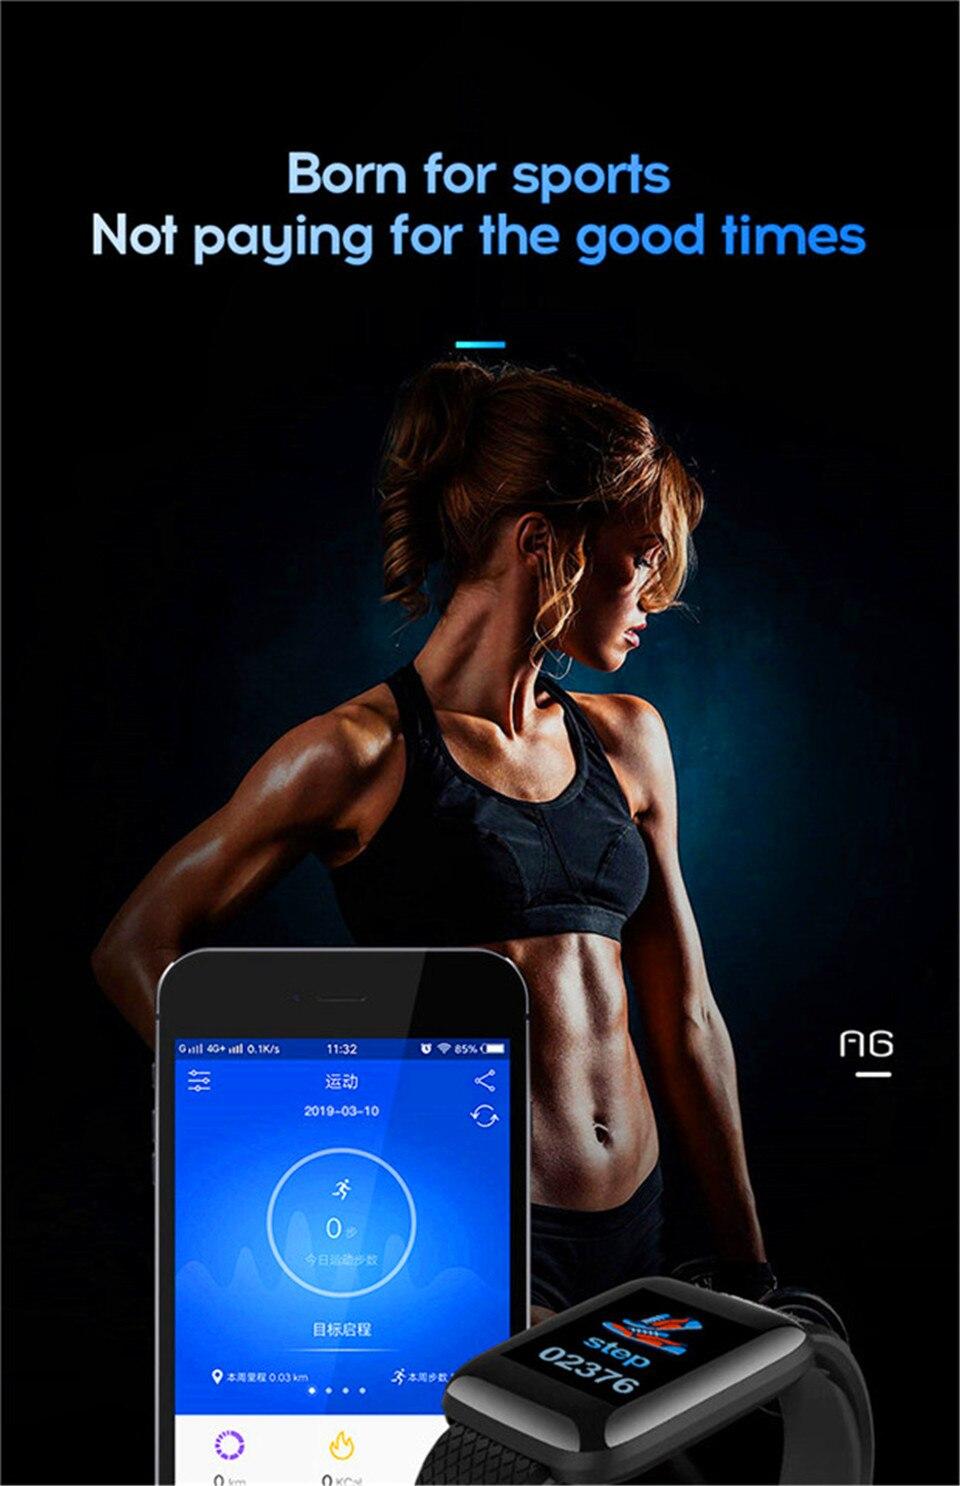 HTB1GWruO6TpK1RjSZKPq6y3UpXaM Smart Wristband Heart Rate Monitor Smart Fitness Bracelet Blood Pressure Waterproof IP67 Fitness Tracker Watch For Women Men